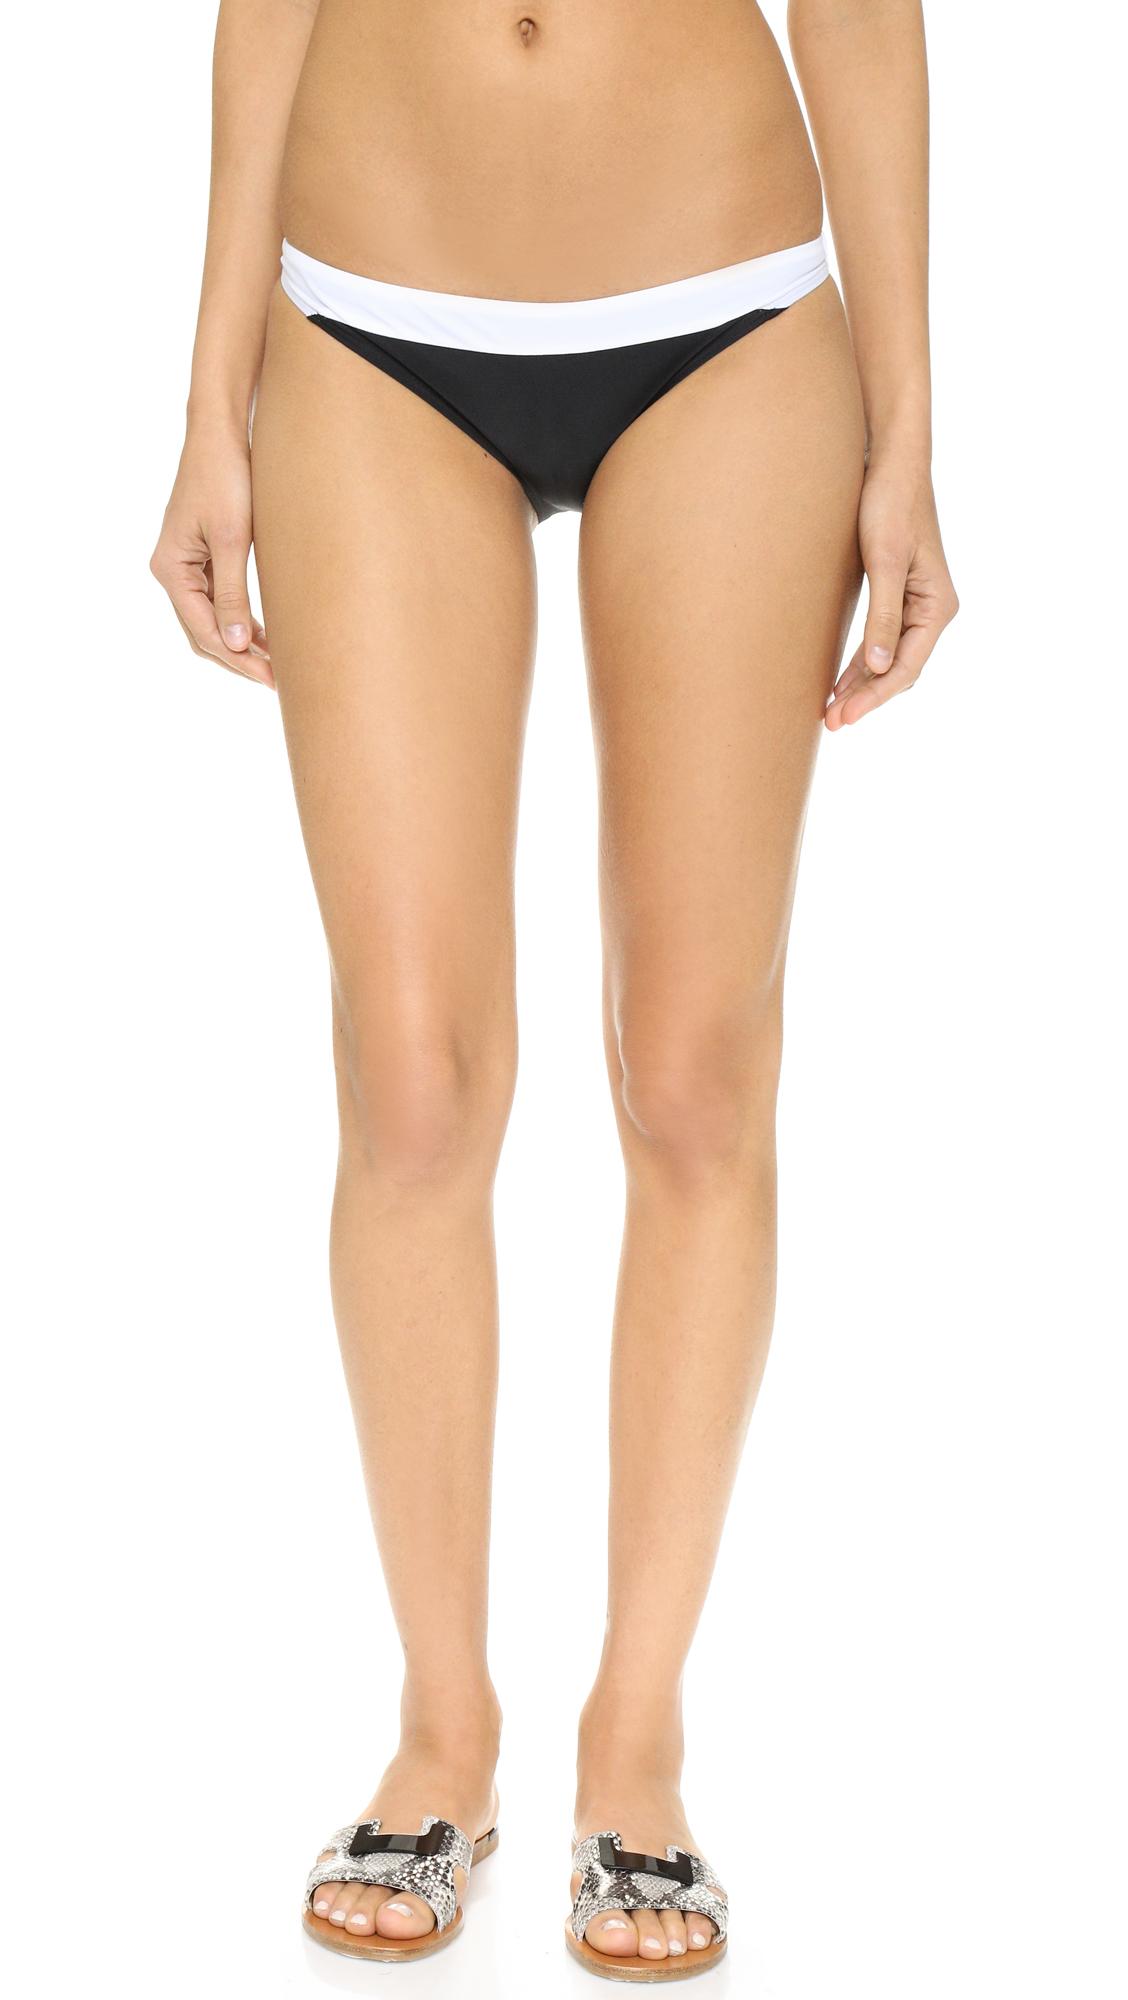 diane von furstenberg female diane von furstenberg malibu bikini bottoms blackwhite